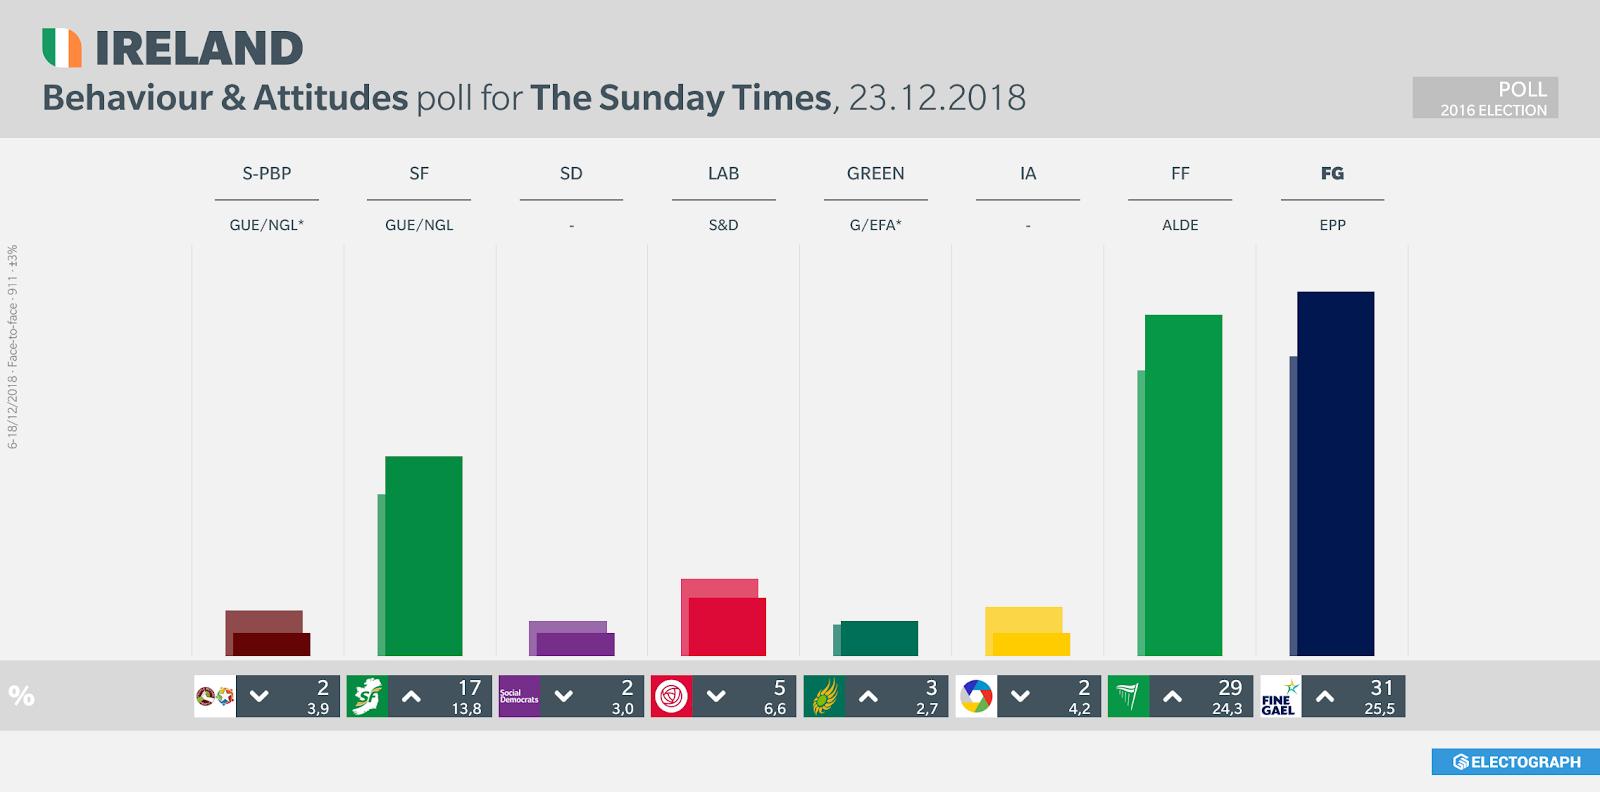 IRELAND: Behaviour & Attitudes poll chart for The Sunday Times, 23 December 2018